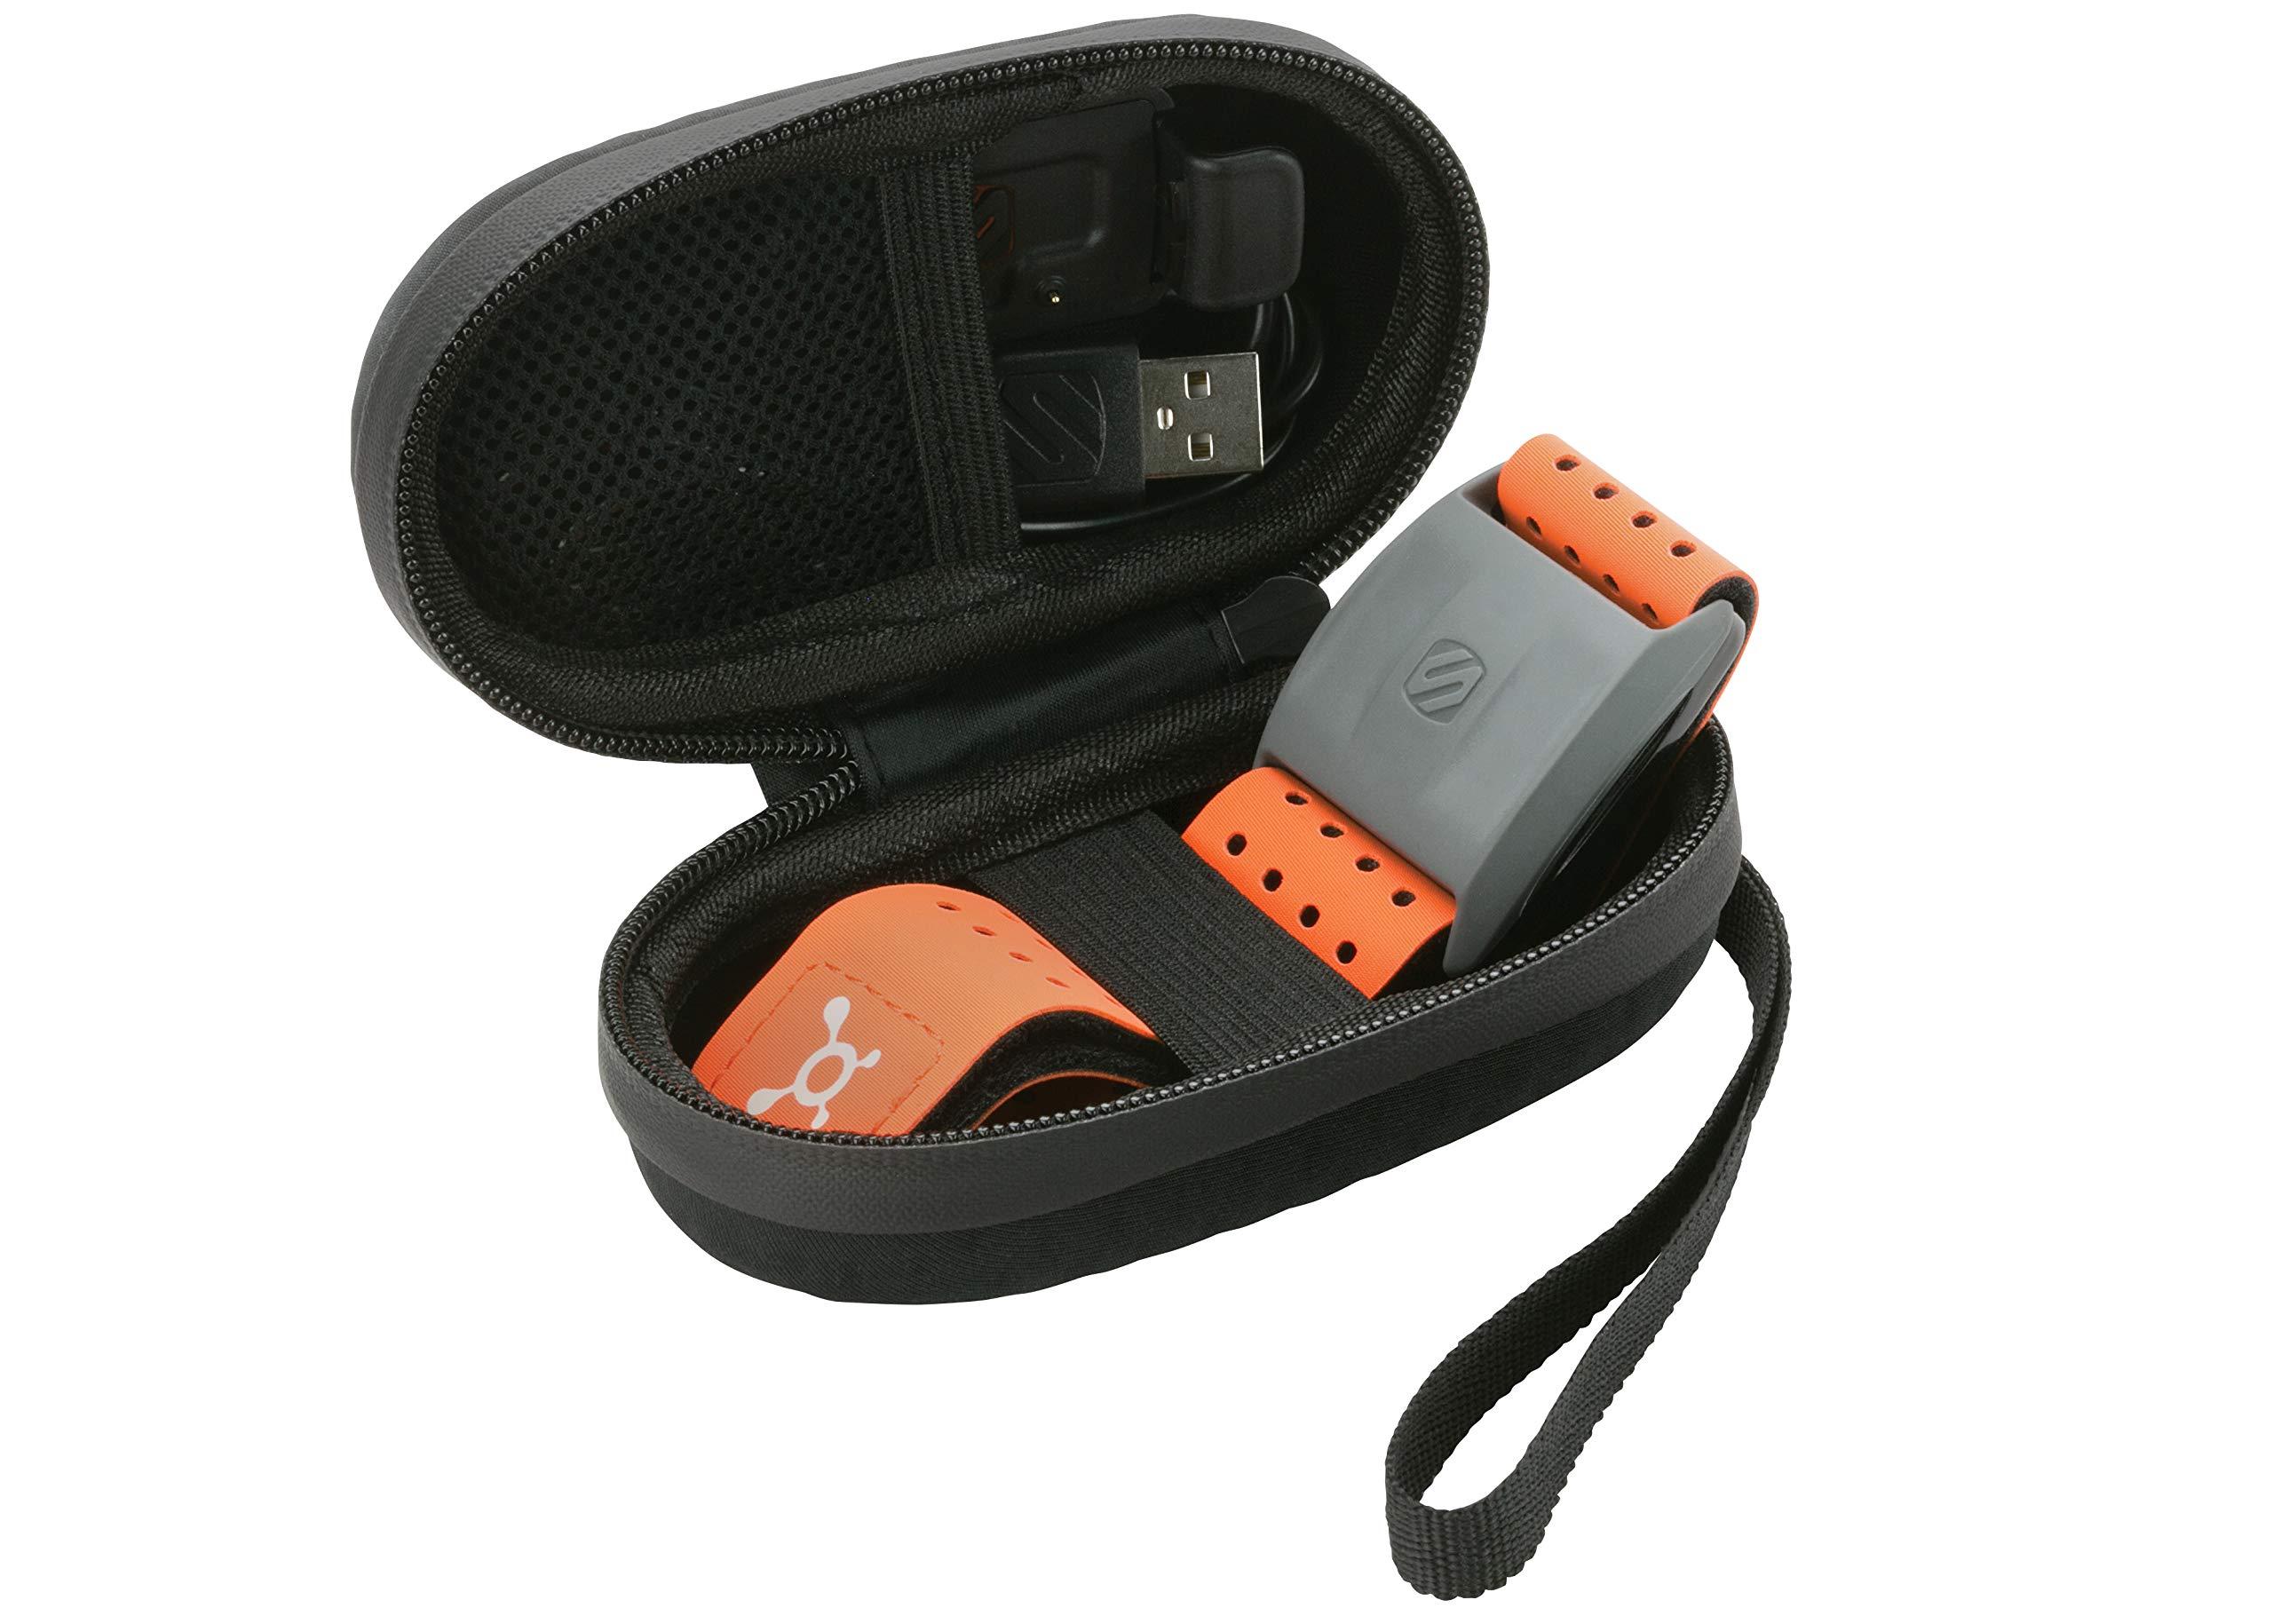 Scosche Rhythm Zipper Case | Hard Case for Rhythm+ and Rhythm 24 (Black) by Scosche (Image #3)